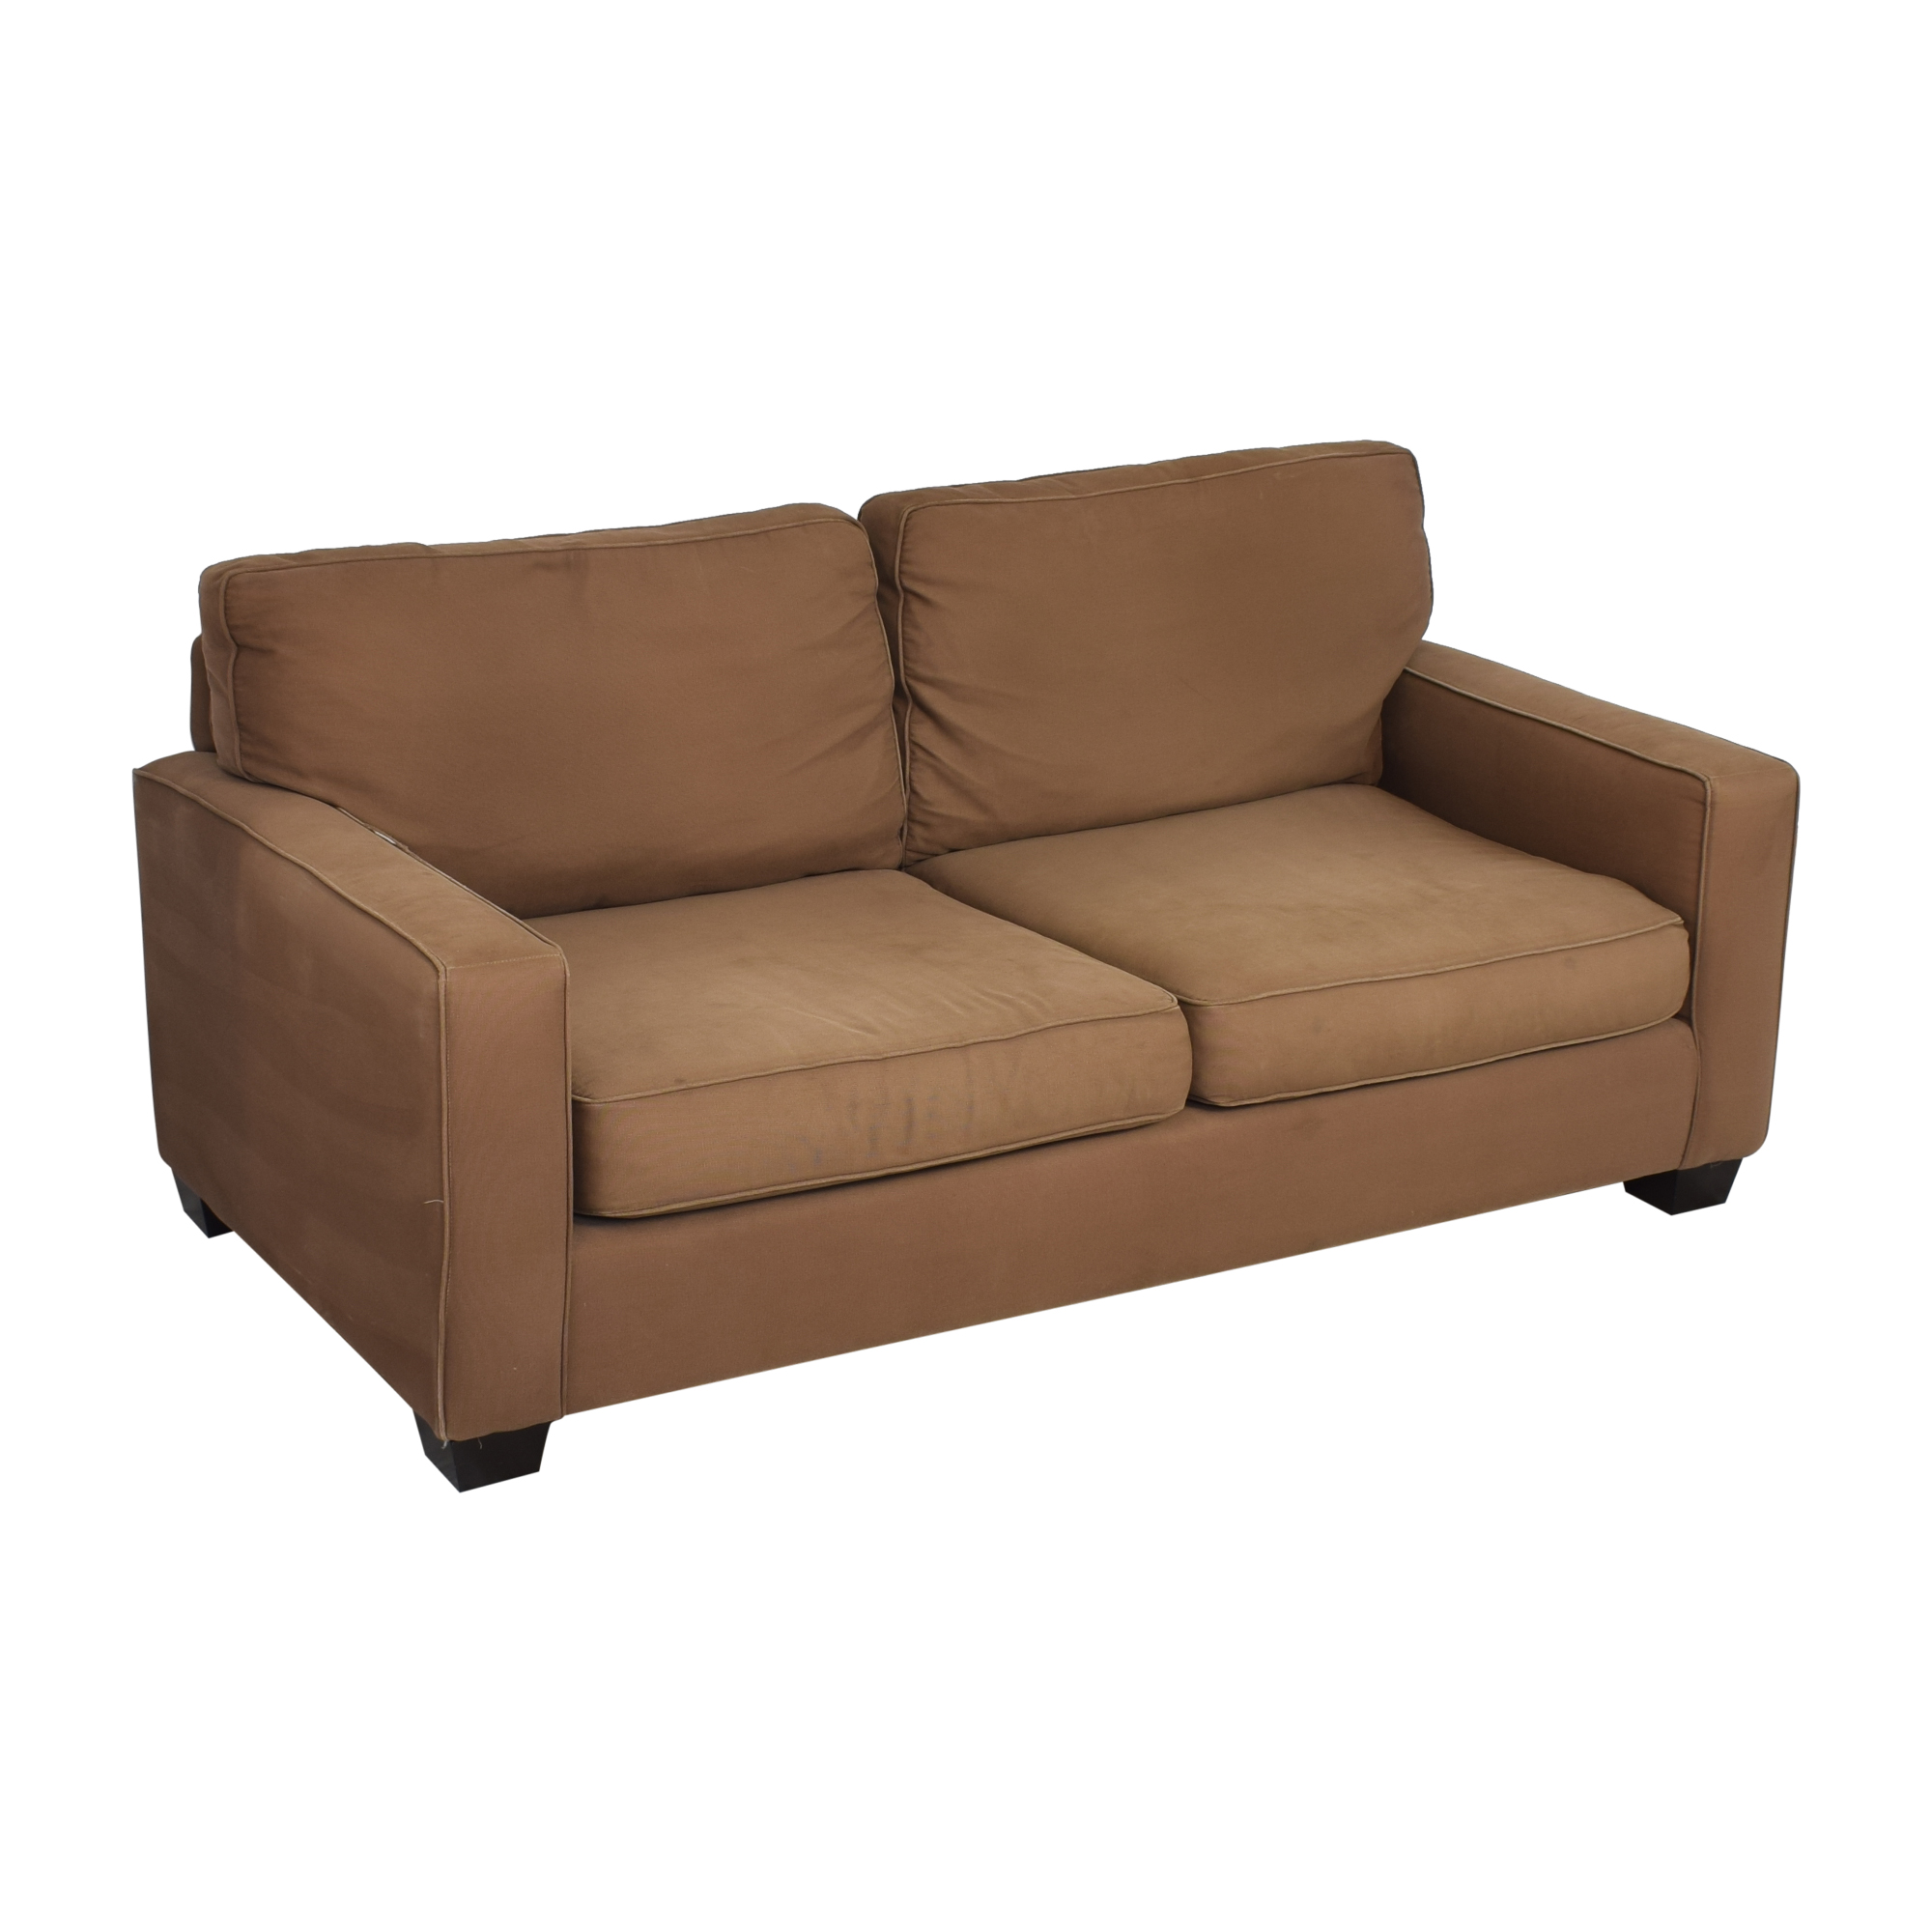 Pottery Barn PB Comfort Square Arm Upholstered Sofa / Classic Sofas